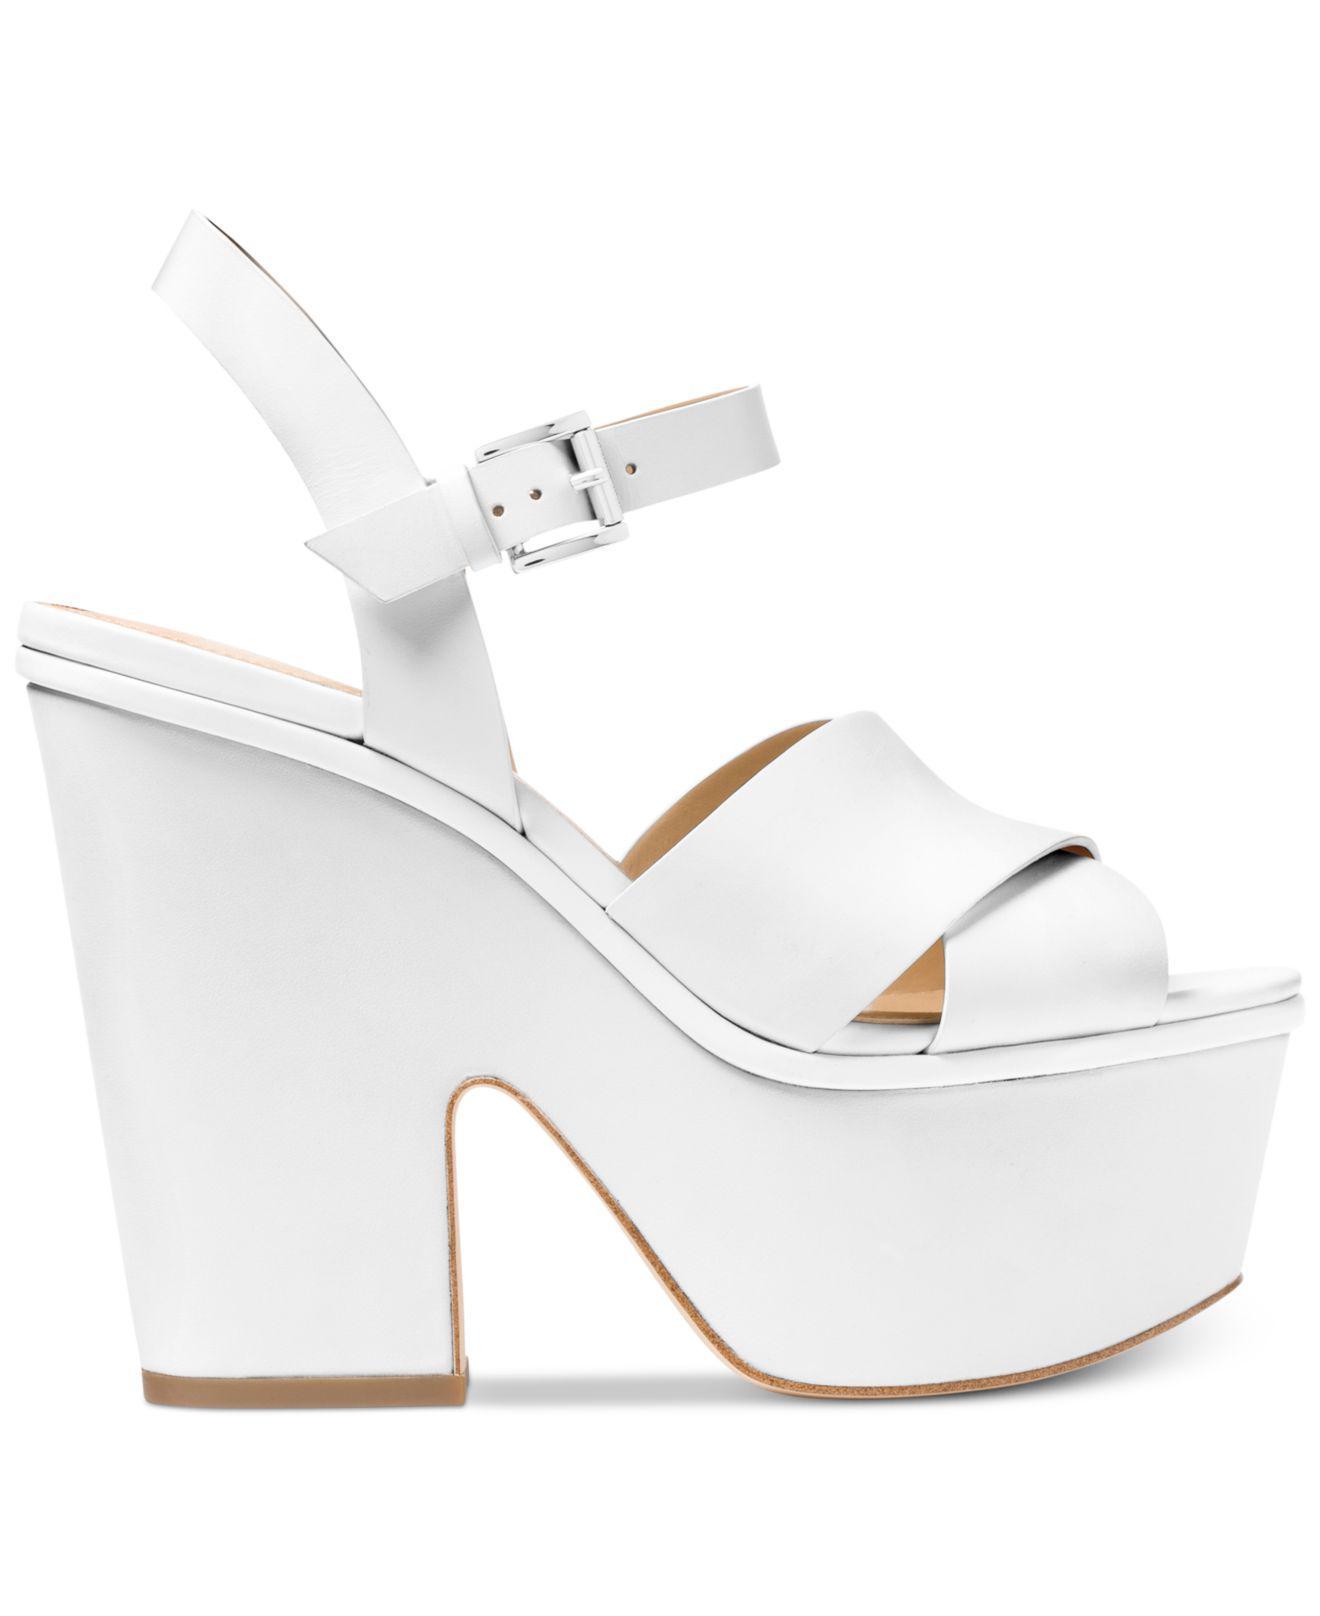 1e6b0f235cc Michael Kors Michael Divia Wedge Sandals in White - Lyst